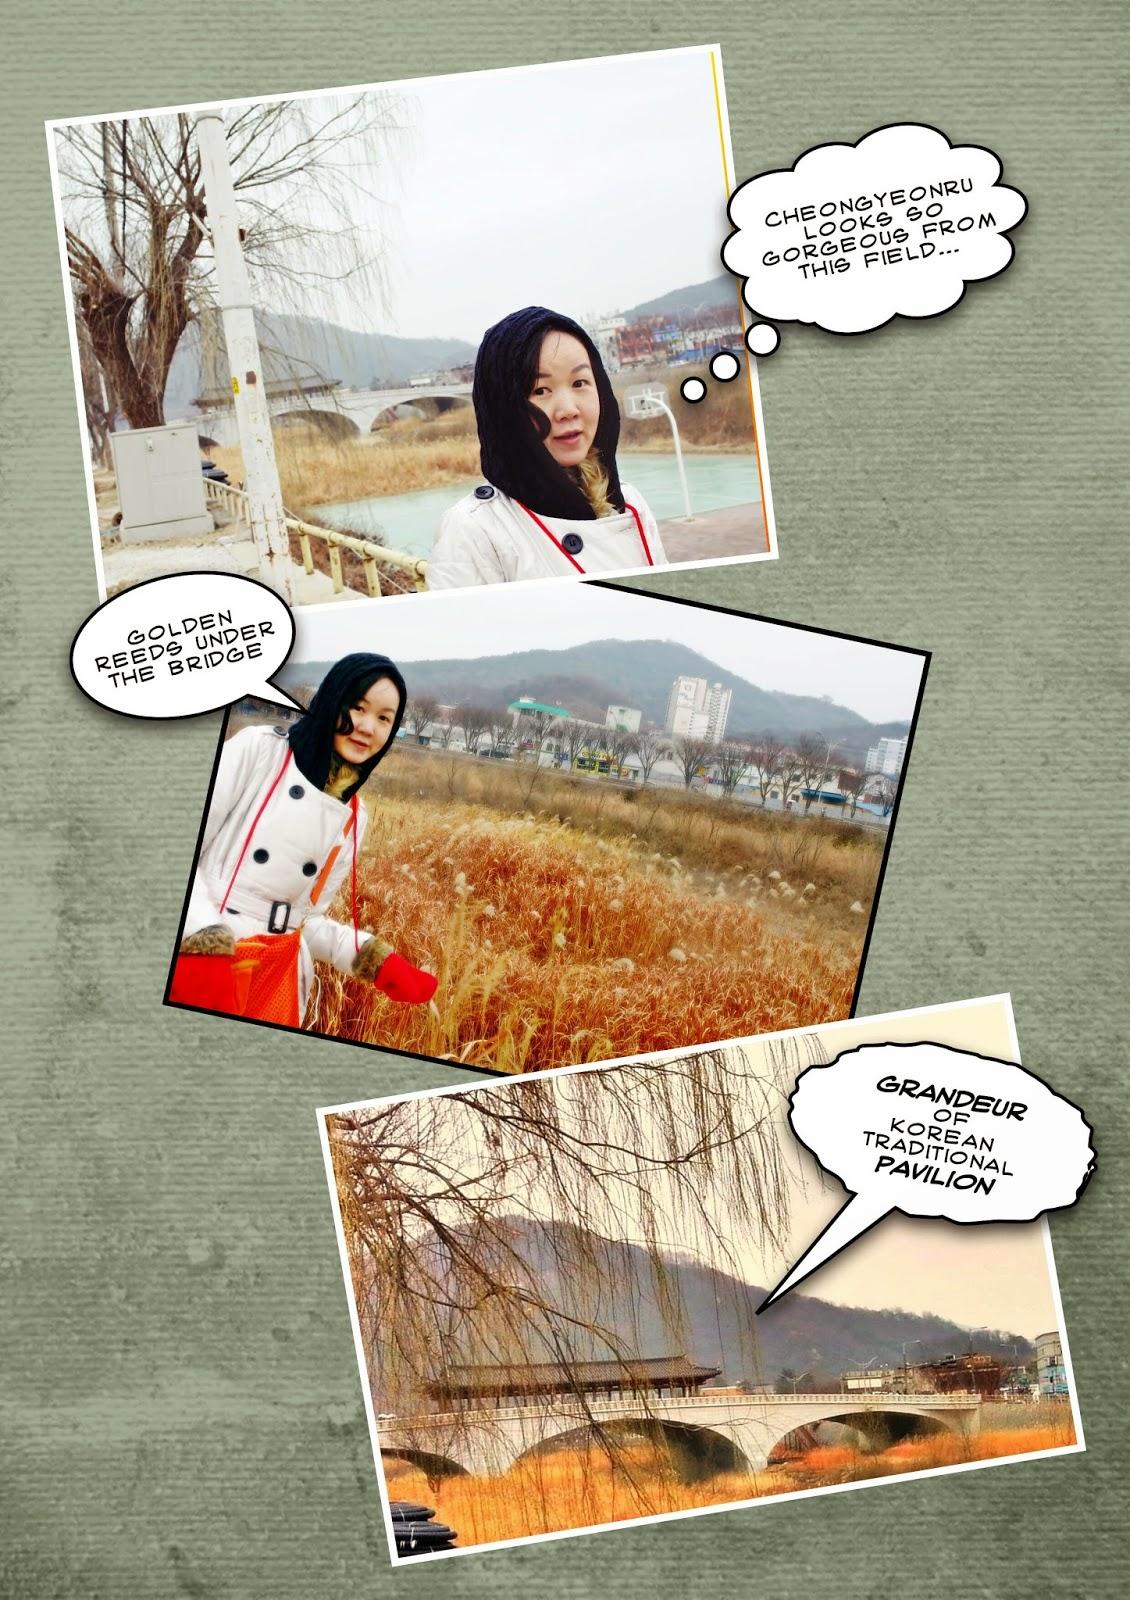 Jeonju - Cheongyeonru Pavilion 청연루 | meheartsoul.blogspot.com